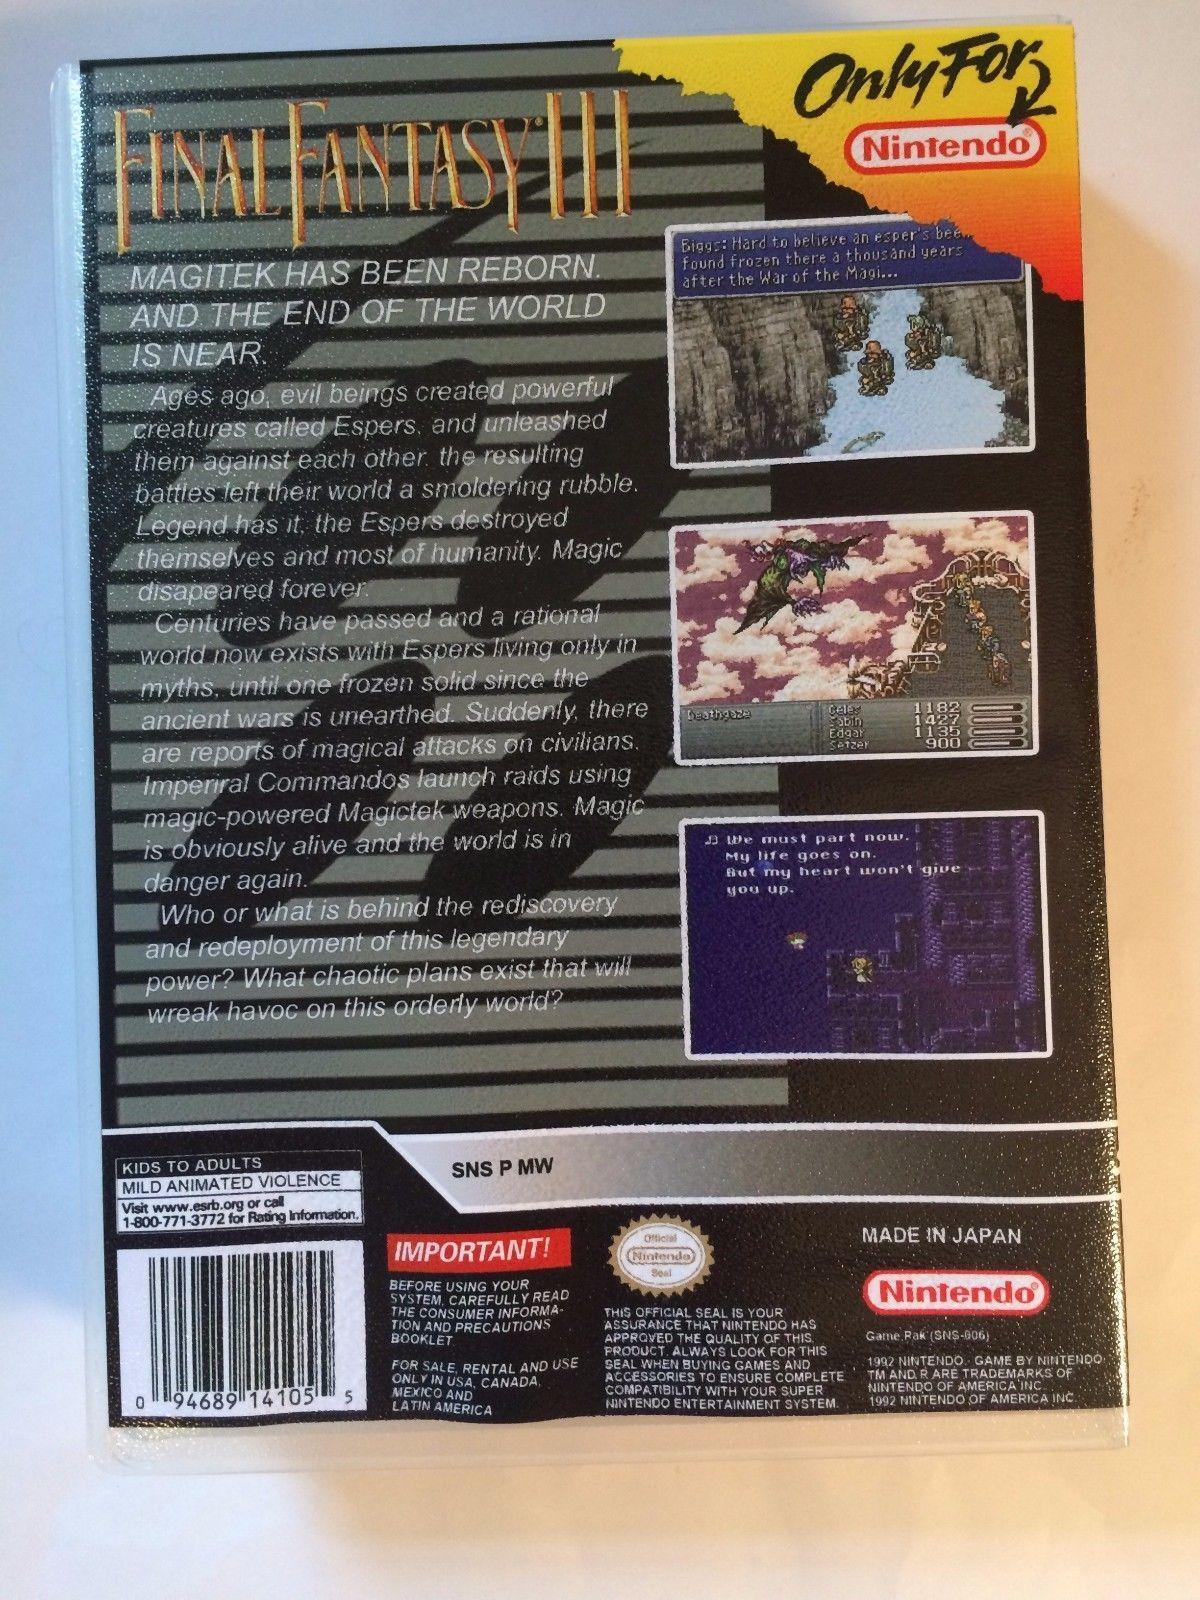 Final Fantasy III - Super Nintendo - Replacement Case - No Game